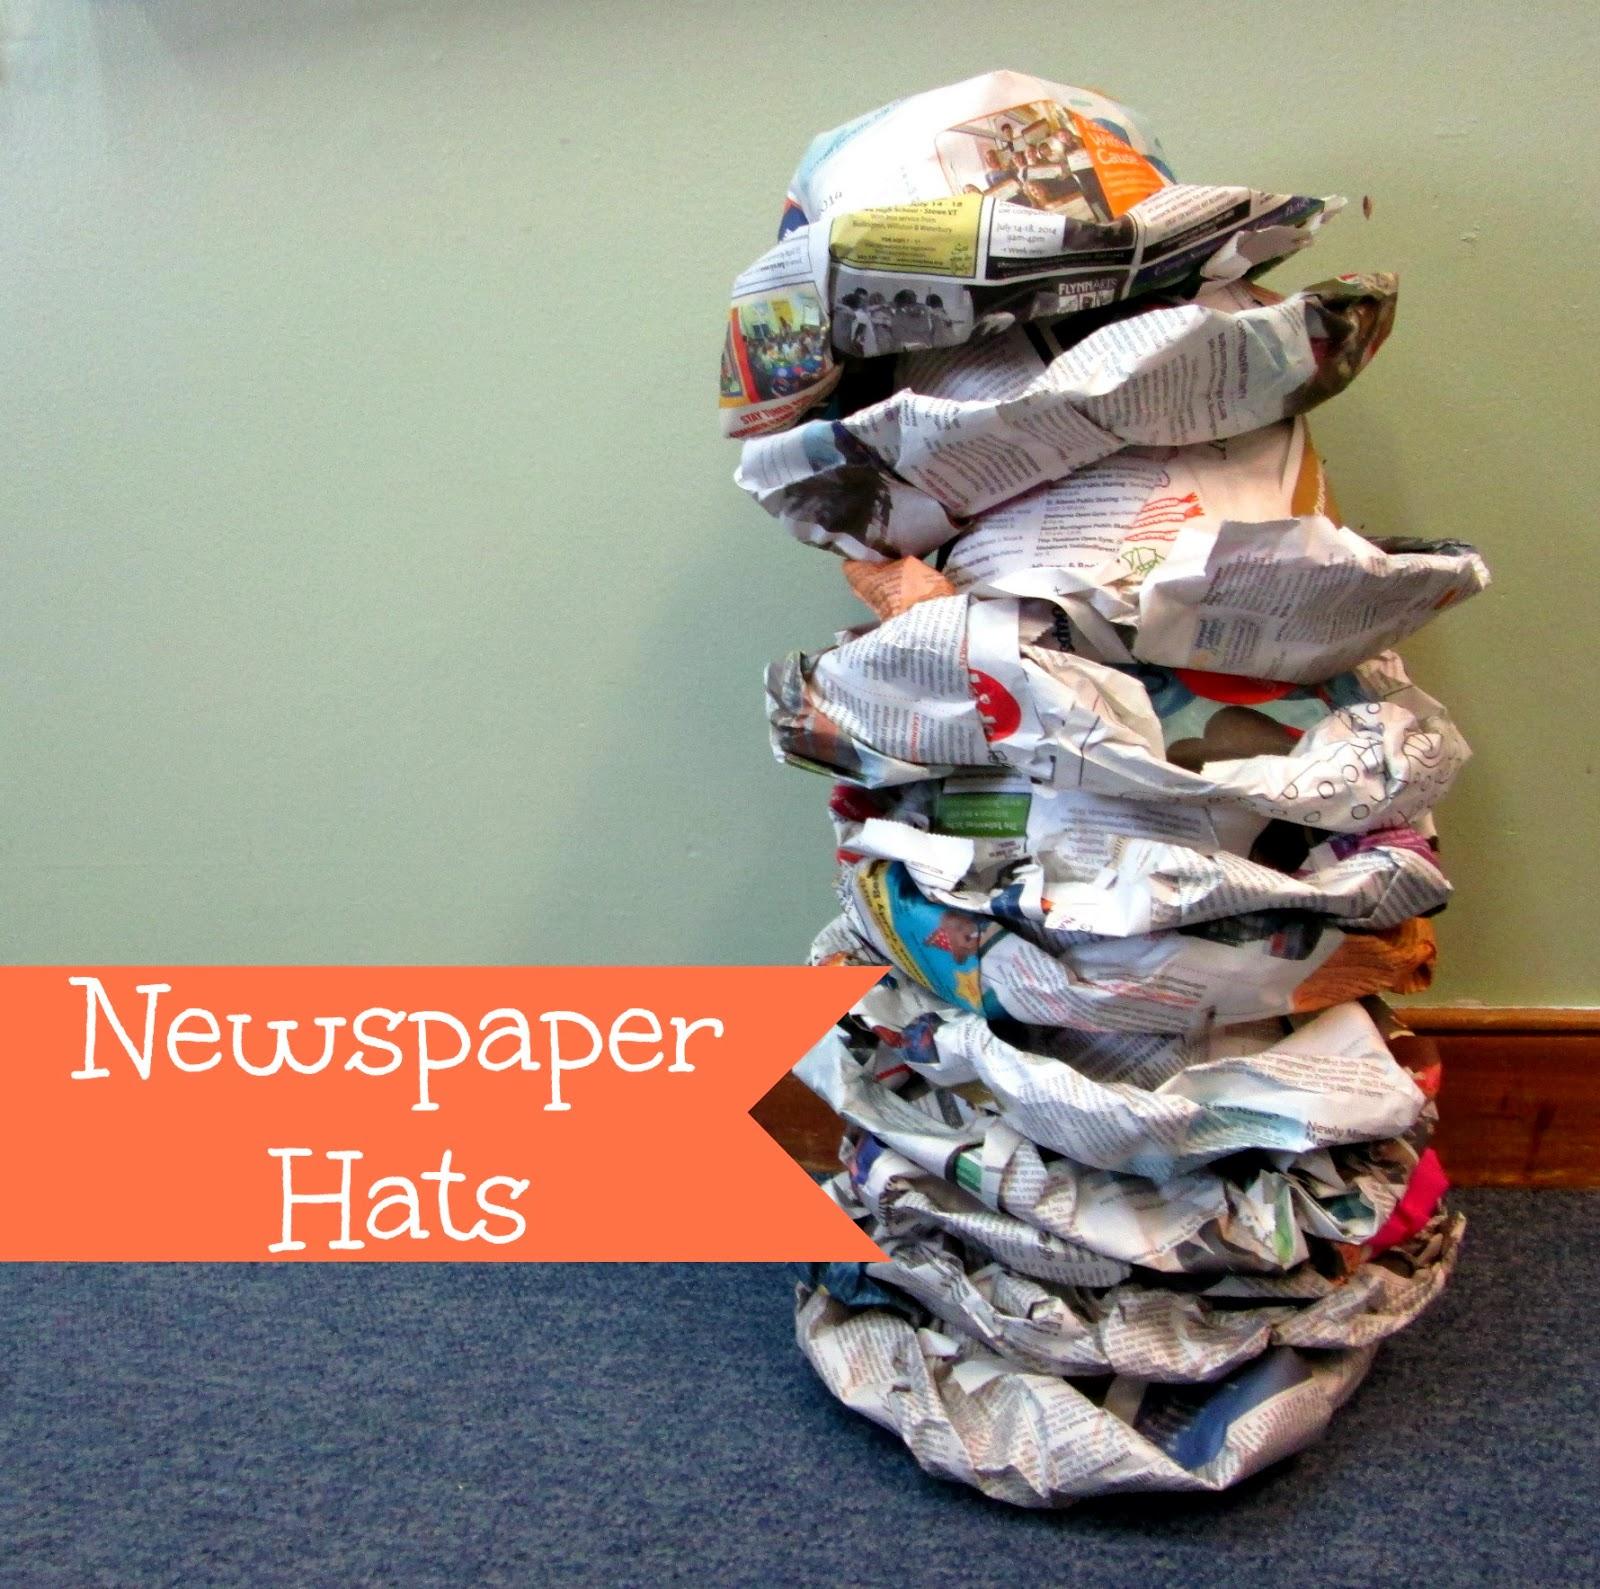 Miss Yellow Shoes Preschool Activity Newspaper Hats